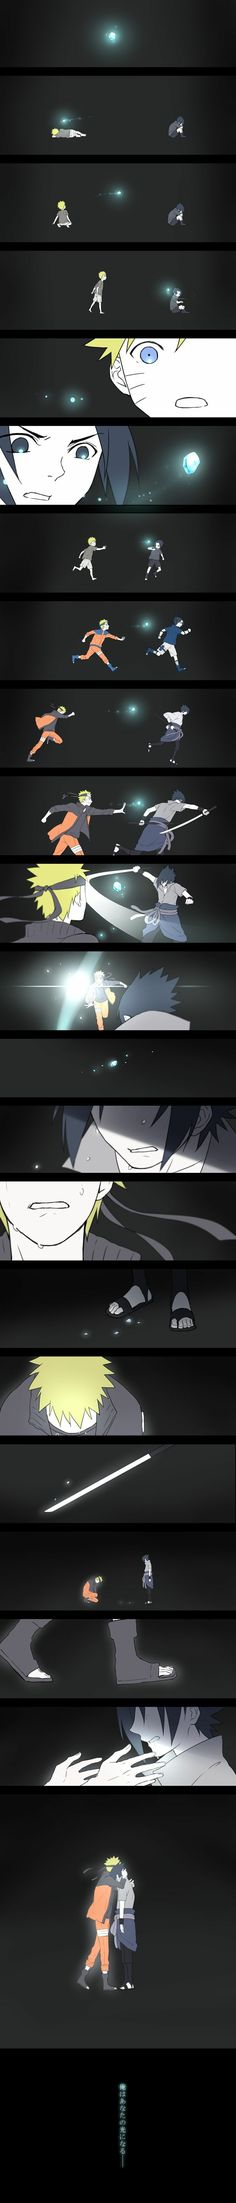 Ilustrasi Cahaya Persahabatan Naruto dan Sasuke